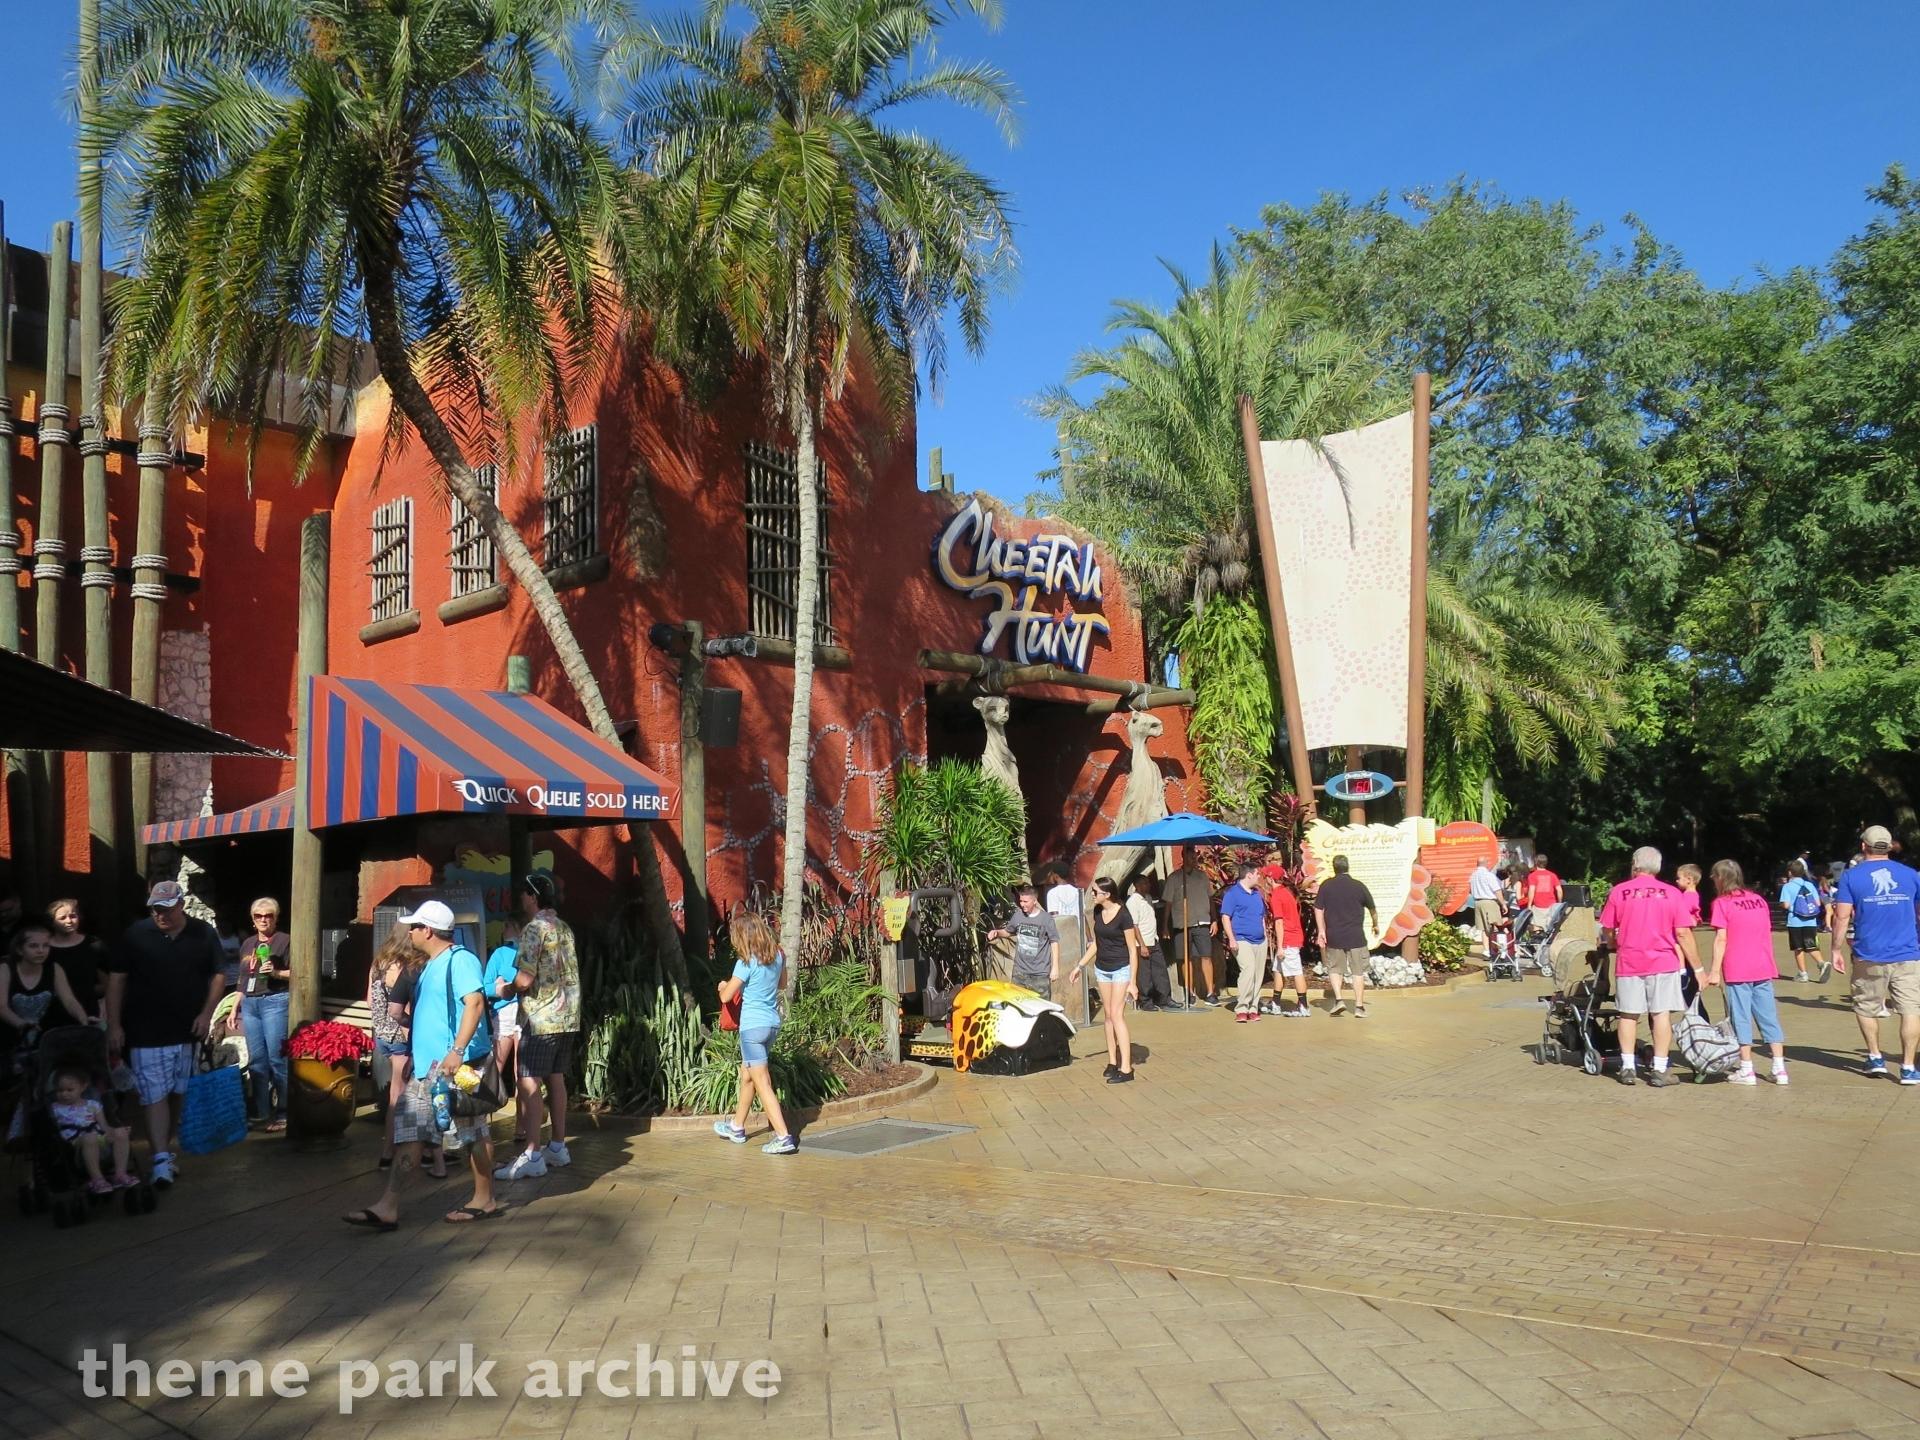 Cheetah Hunt at Busch Gardens Tampa